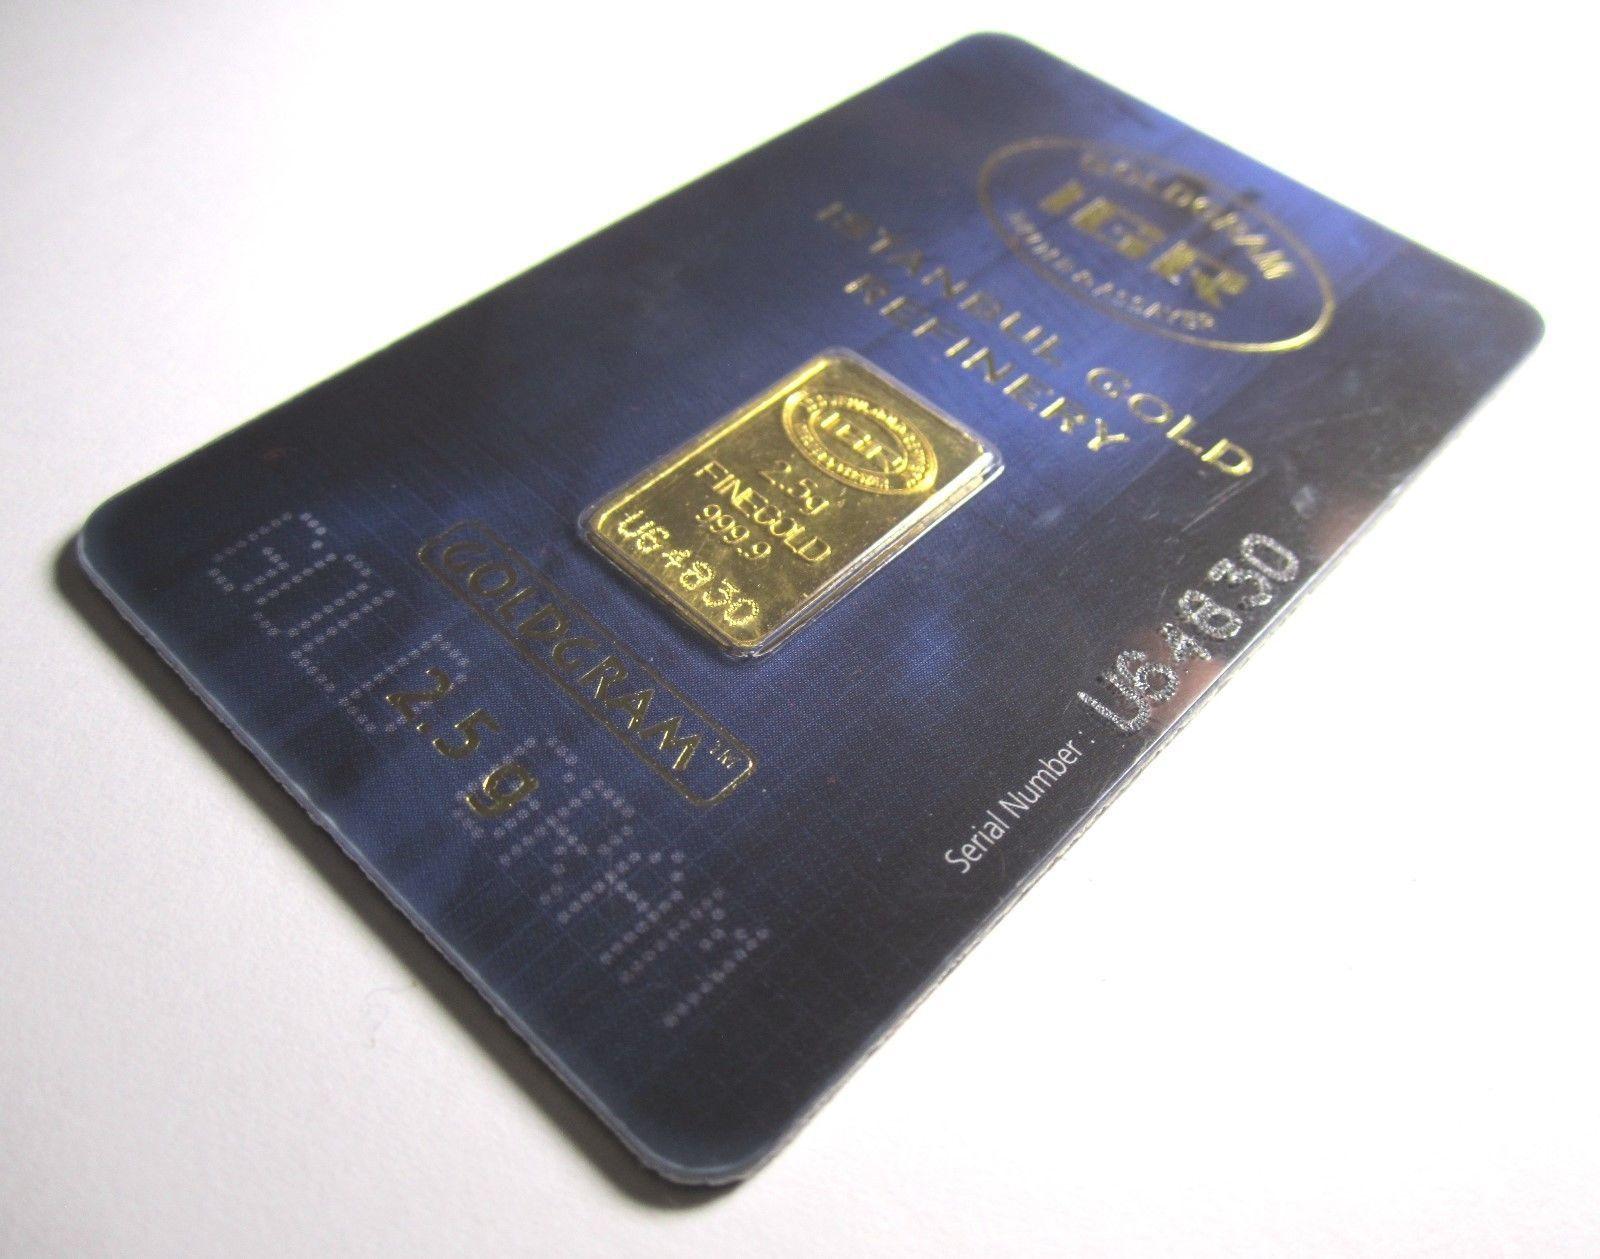 Igr 2 5 Gram 9999 Fine Turkish Gold Bar Goldgram Certified Assayer Invest Now 14kgold Gold Bar Investing Gold Stock